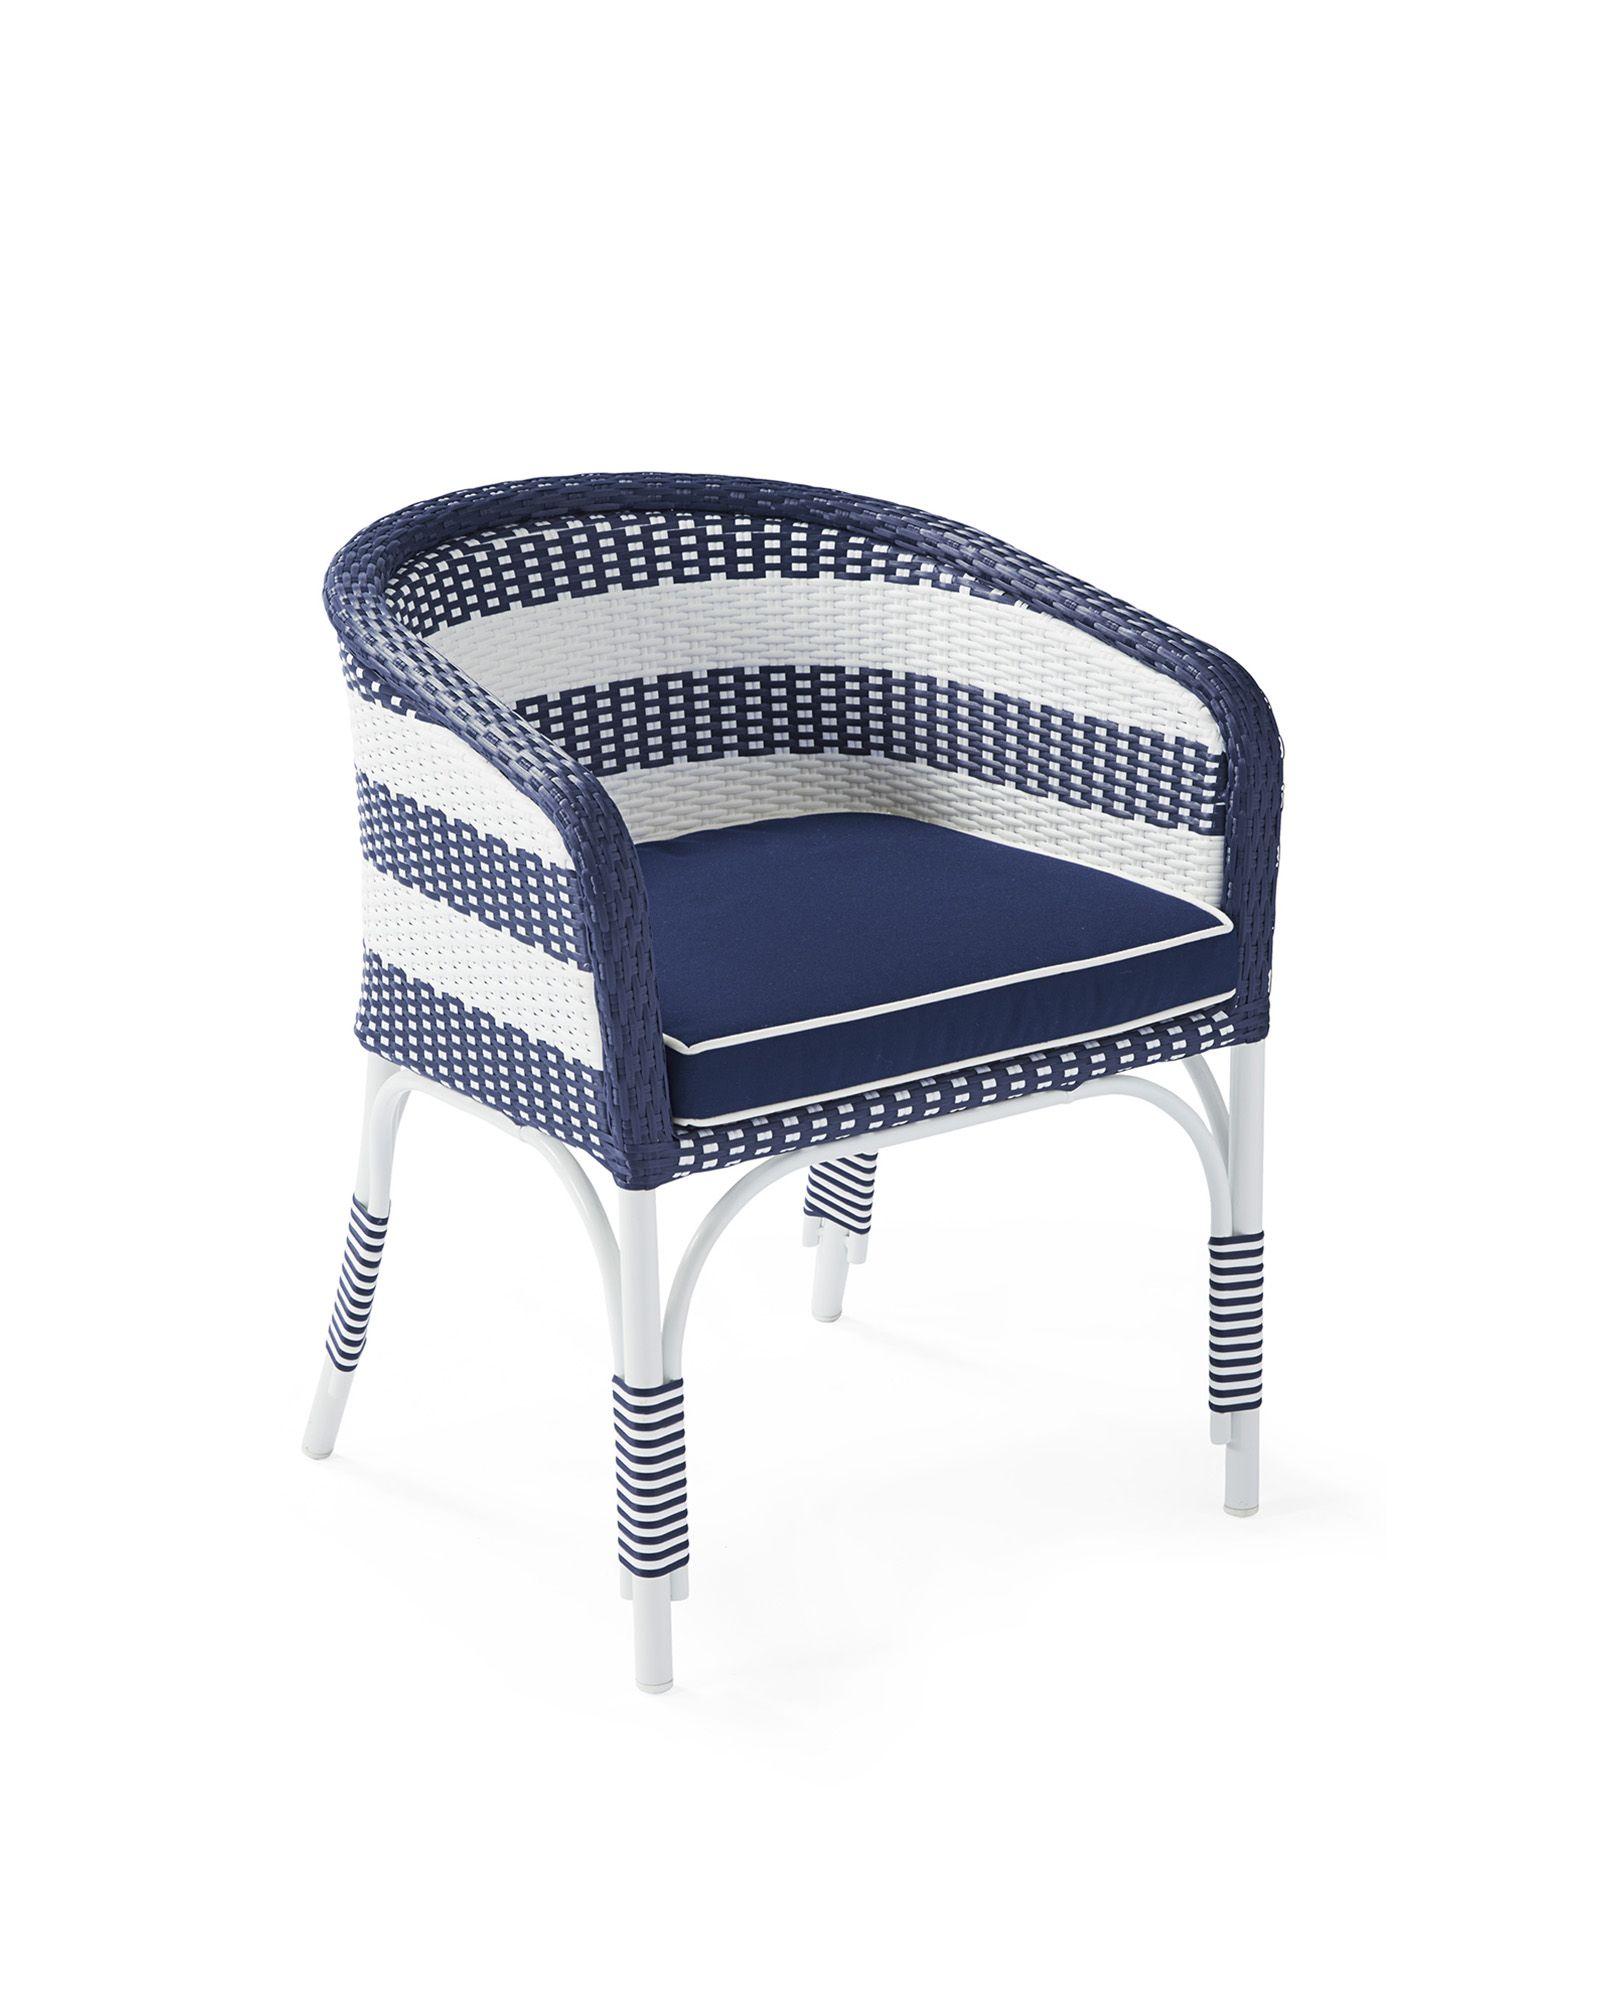 Serena u lily riviera outdoor bucket chair with cushion bucket